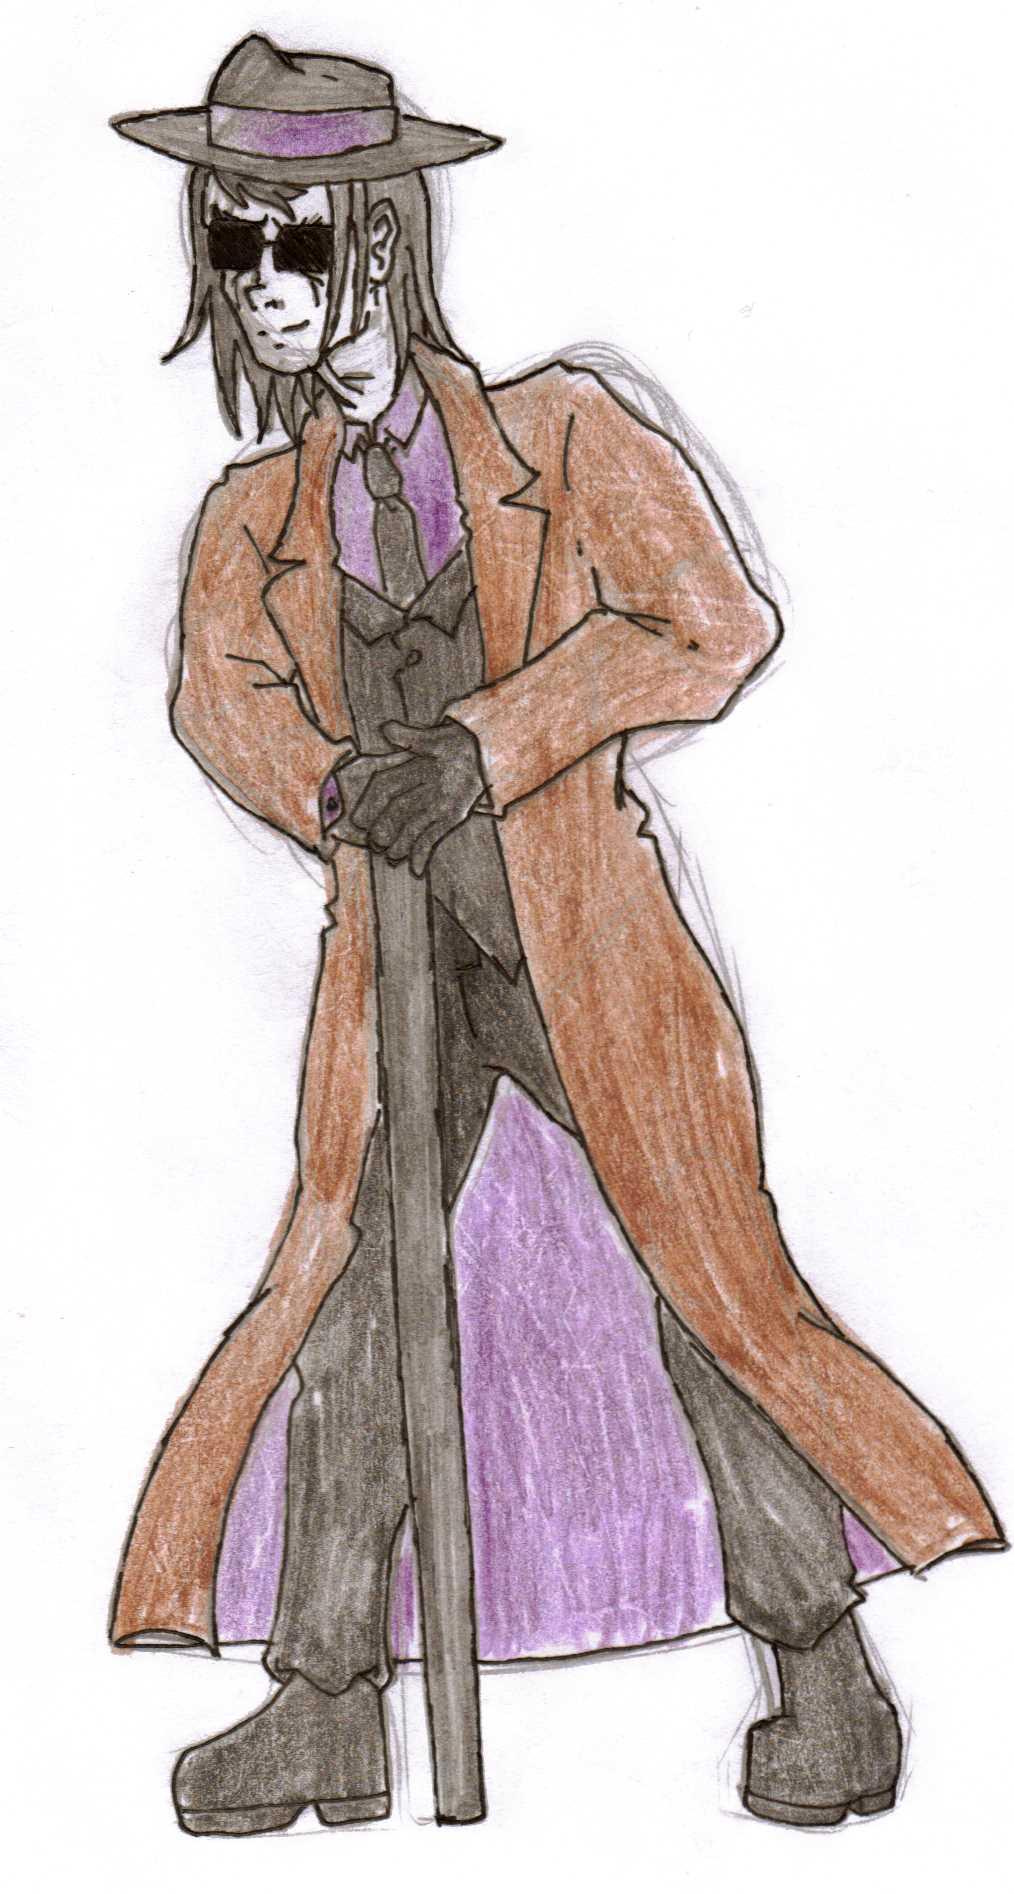 FWOG-Tiresias the Psychic Manipulator by Foxy-Knight